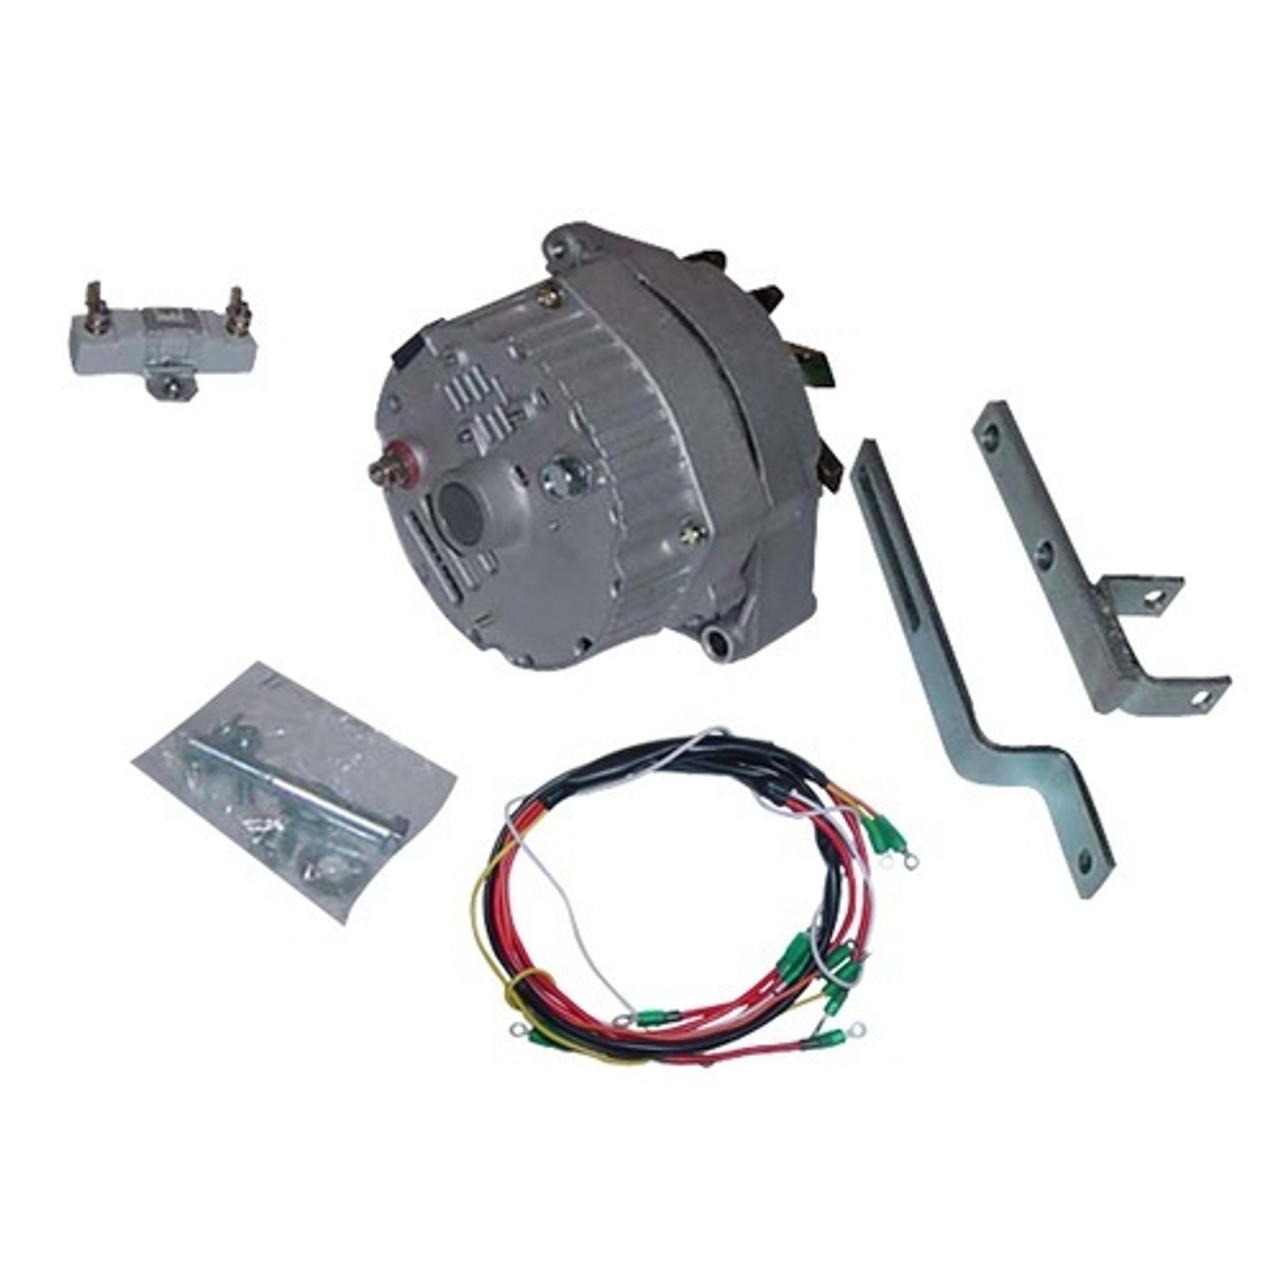 12-Volt Alternator Conversion Kits